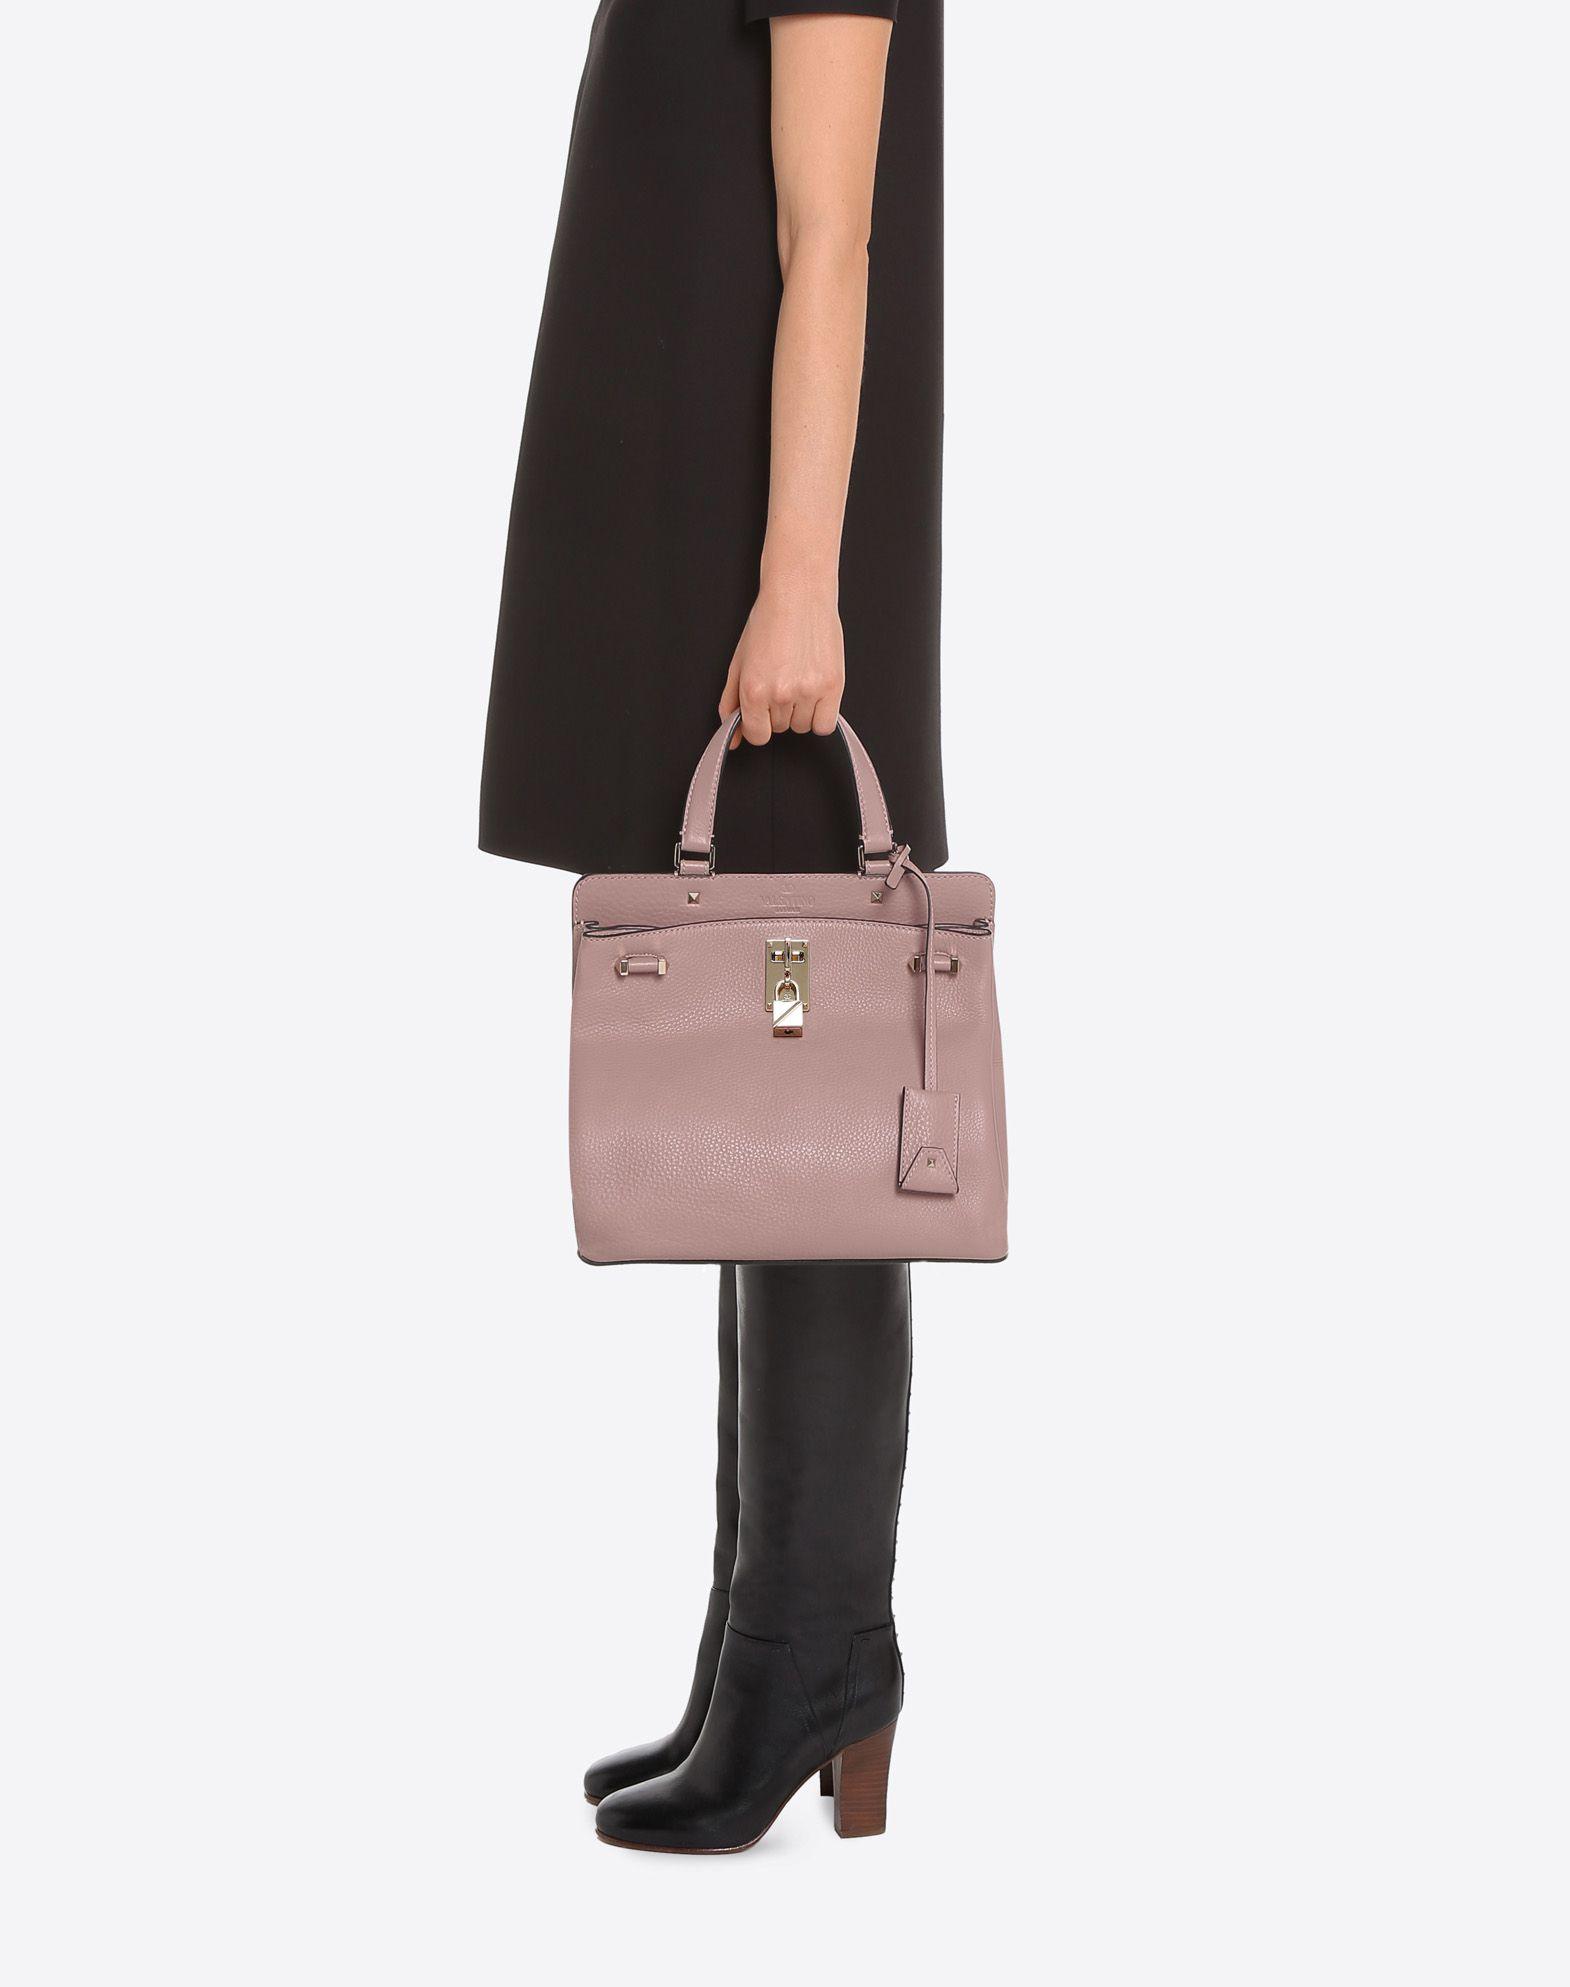 VALENTINO GARAVANI Joylock Medium Handle Bag HANDBAG D a